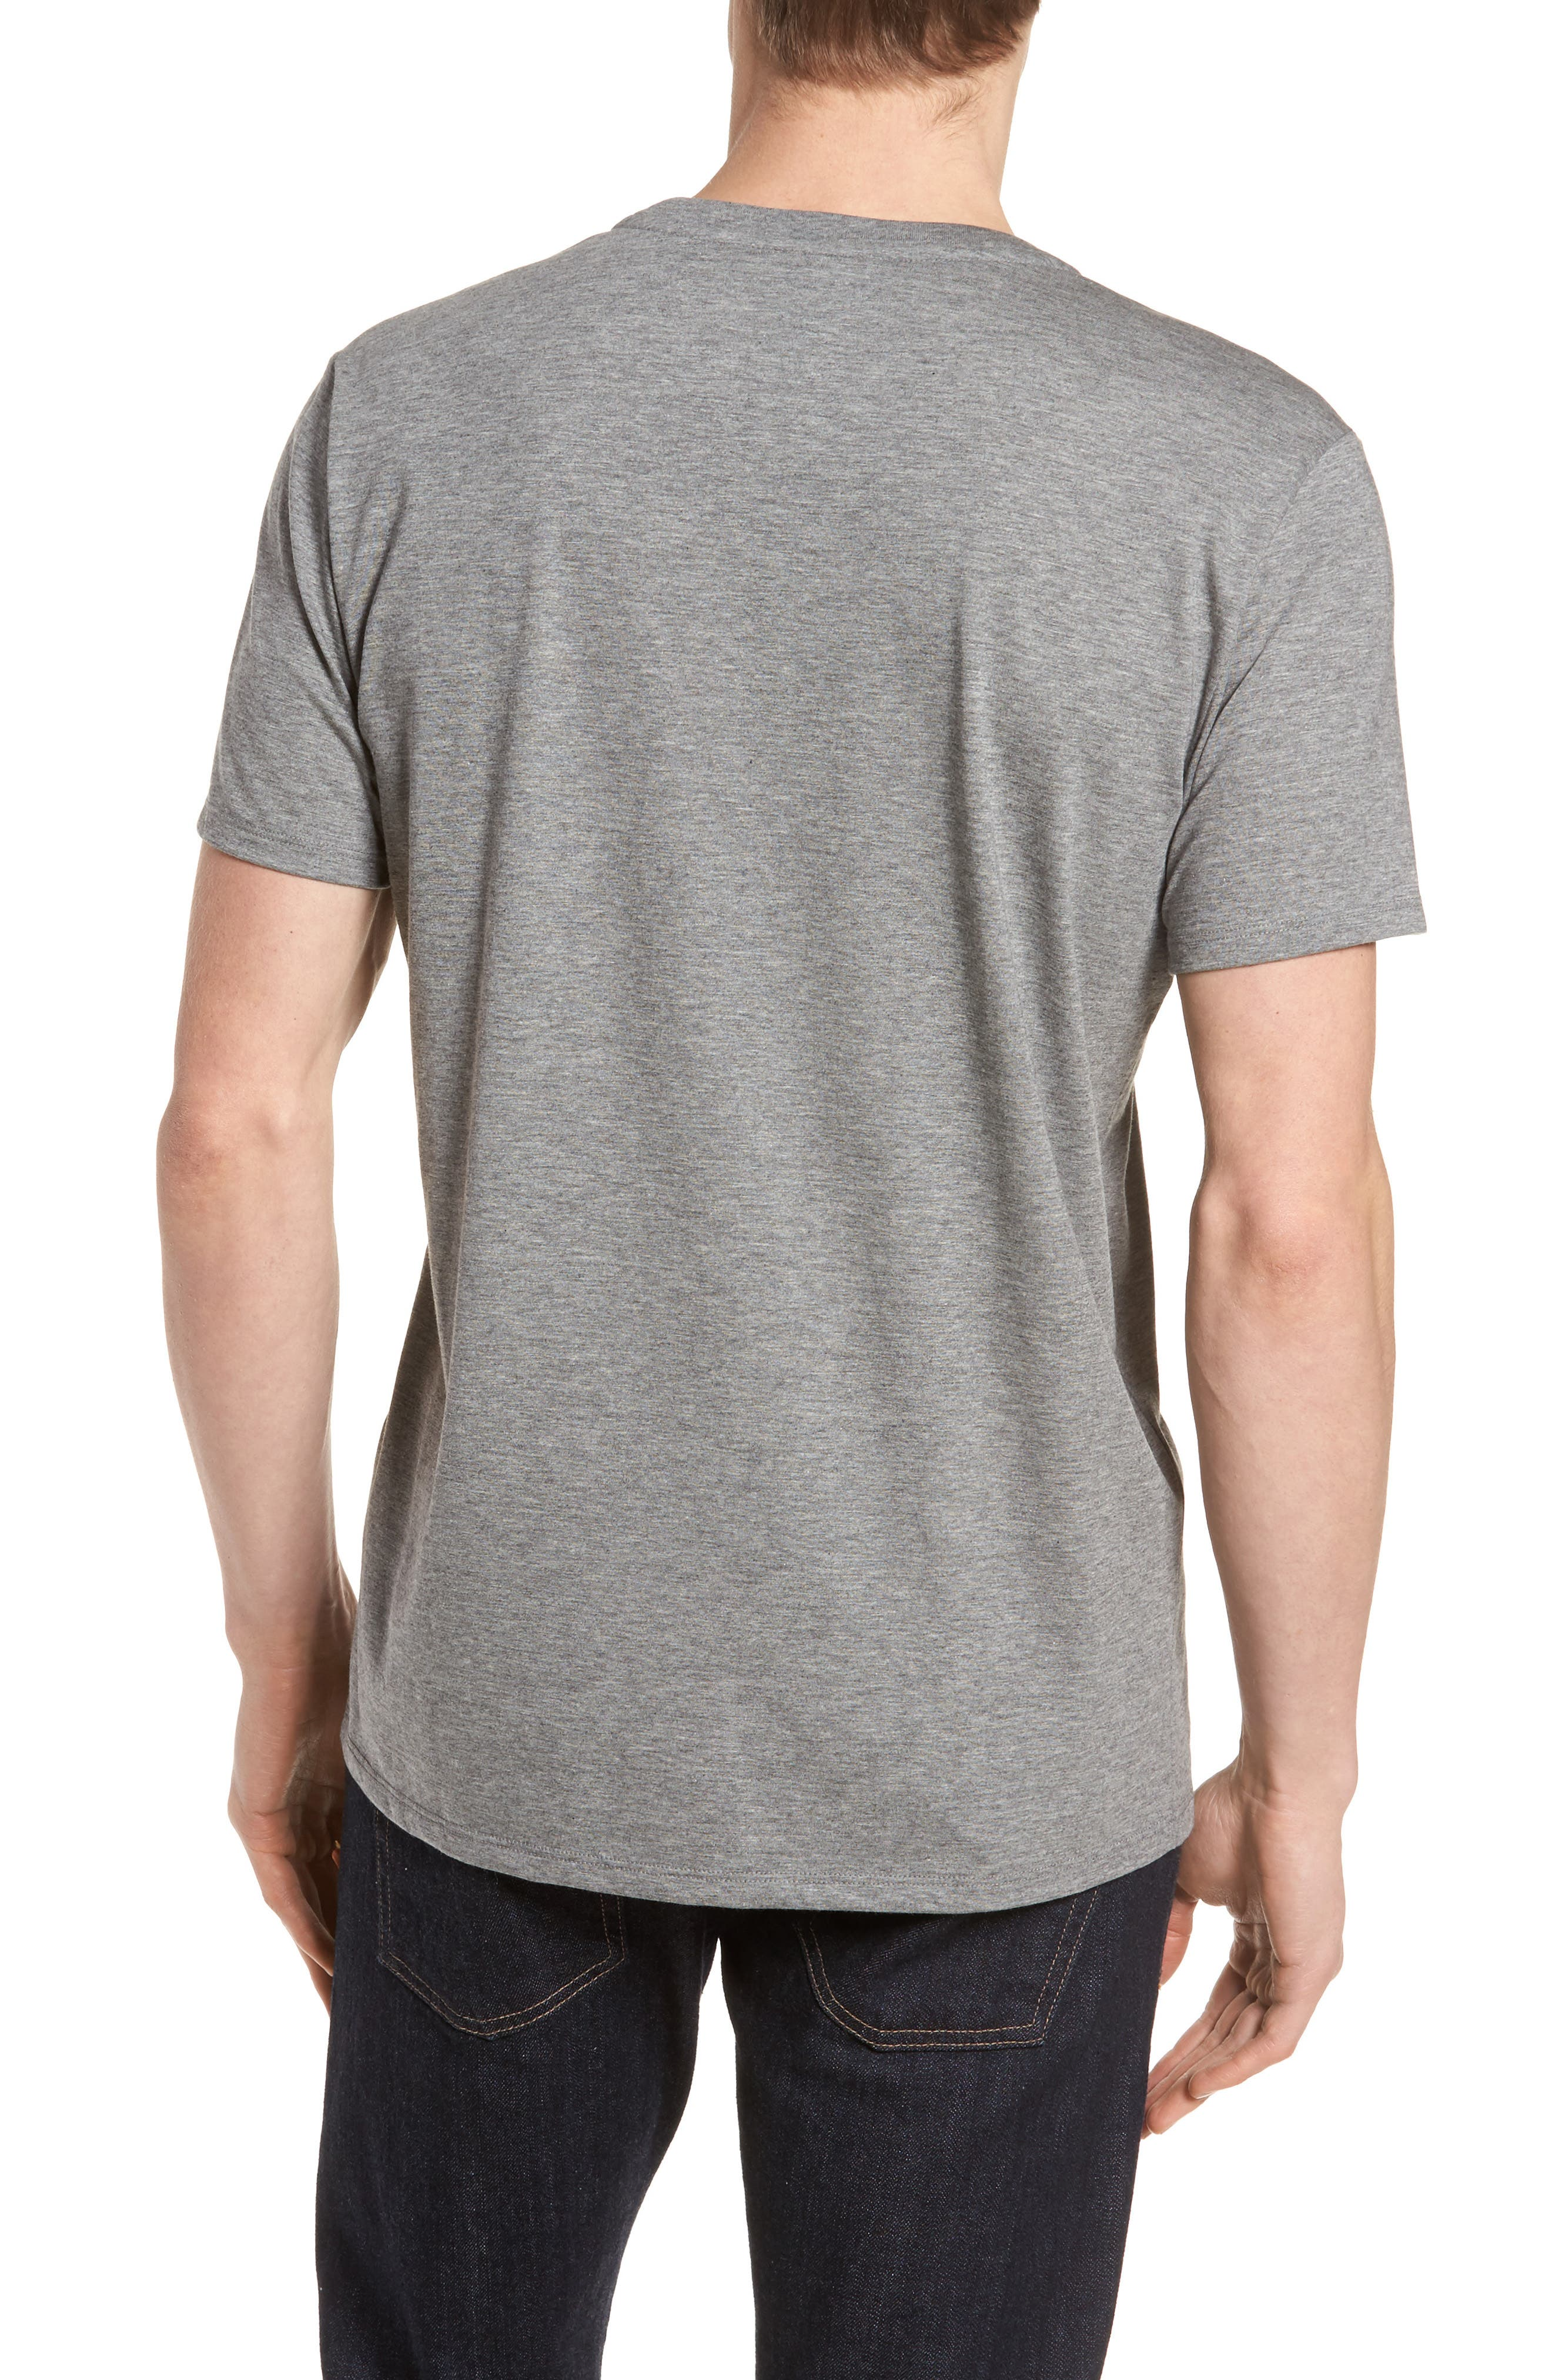 Pima Cotton T-Shirt,                             Alternate thumbnail 2, color,                             GALAXITE CHINE